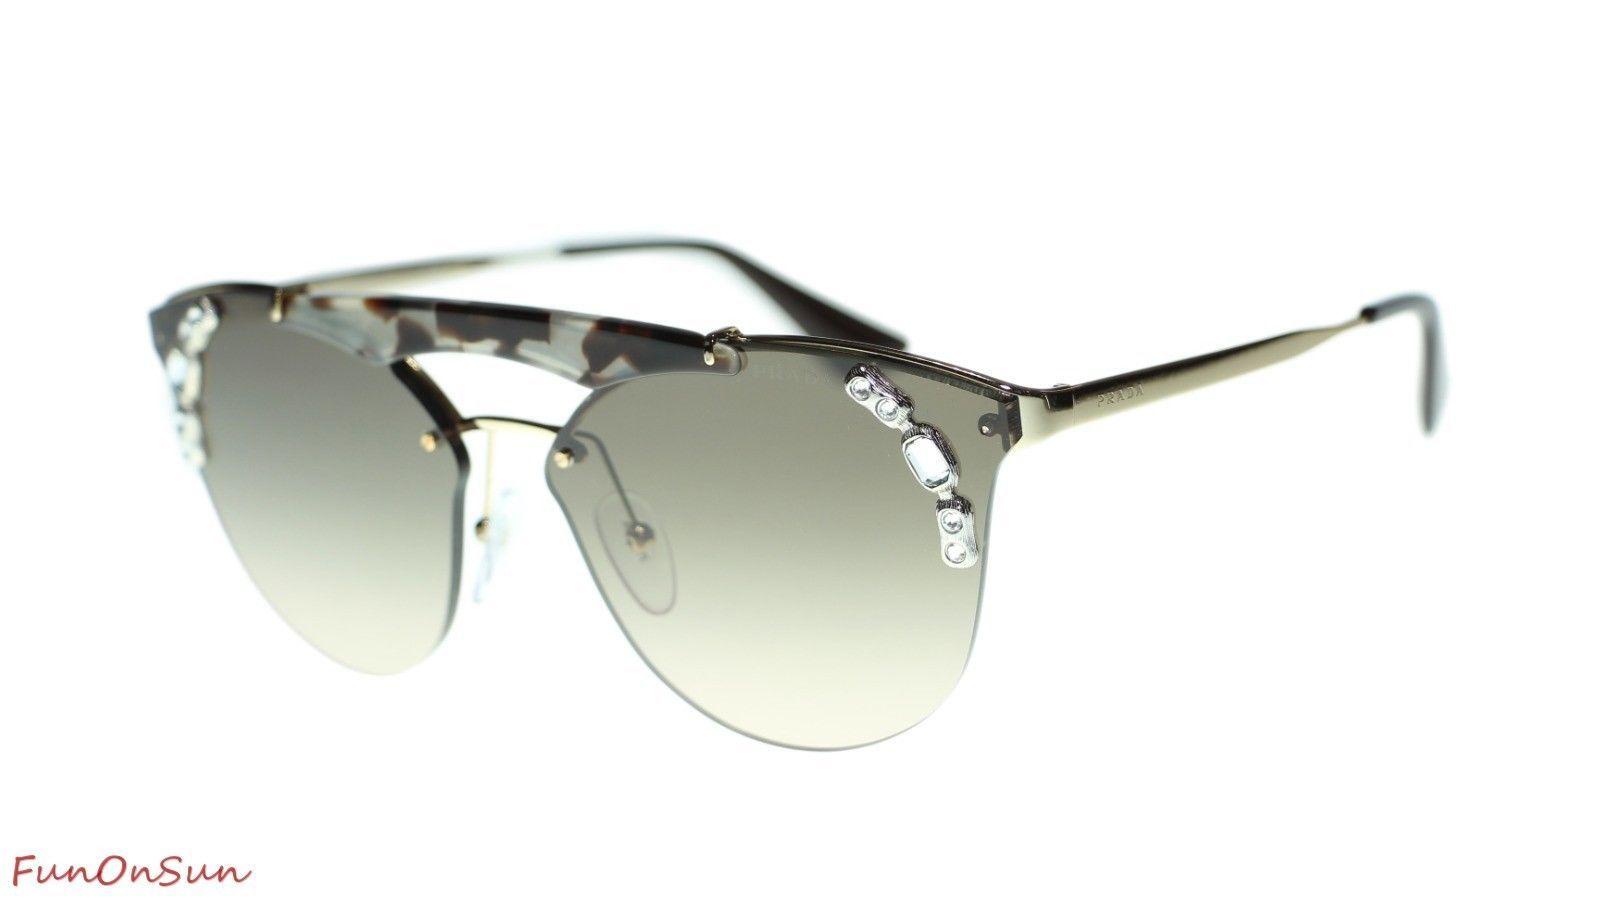 41d800e492 10. 10. Previous. Prada Sunglasses PR53US C3O3D0 Gold Opal Brown Light Brown  Gradient Grey Lens